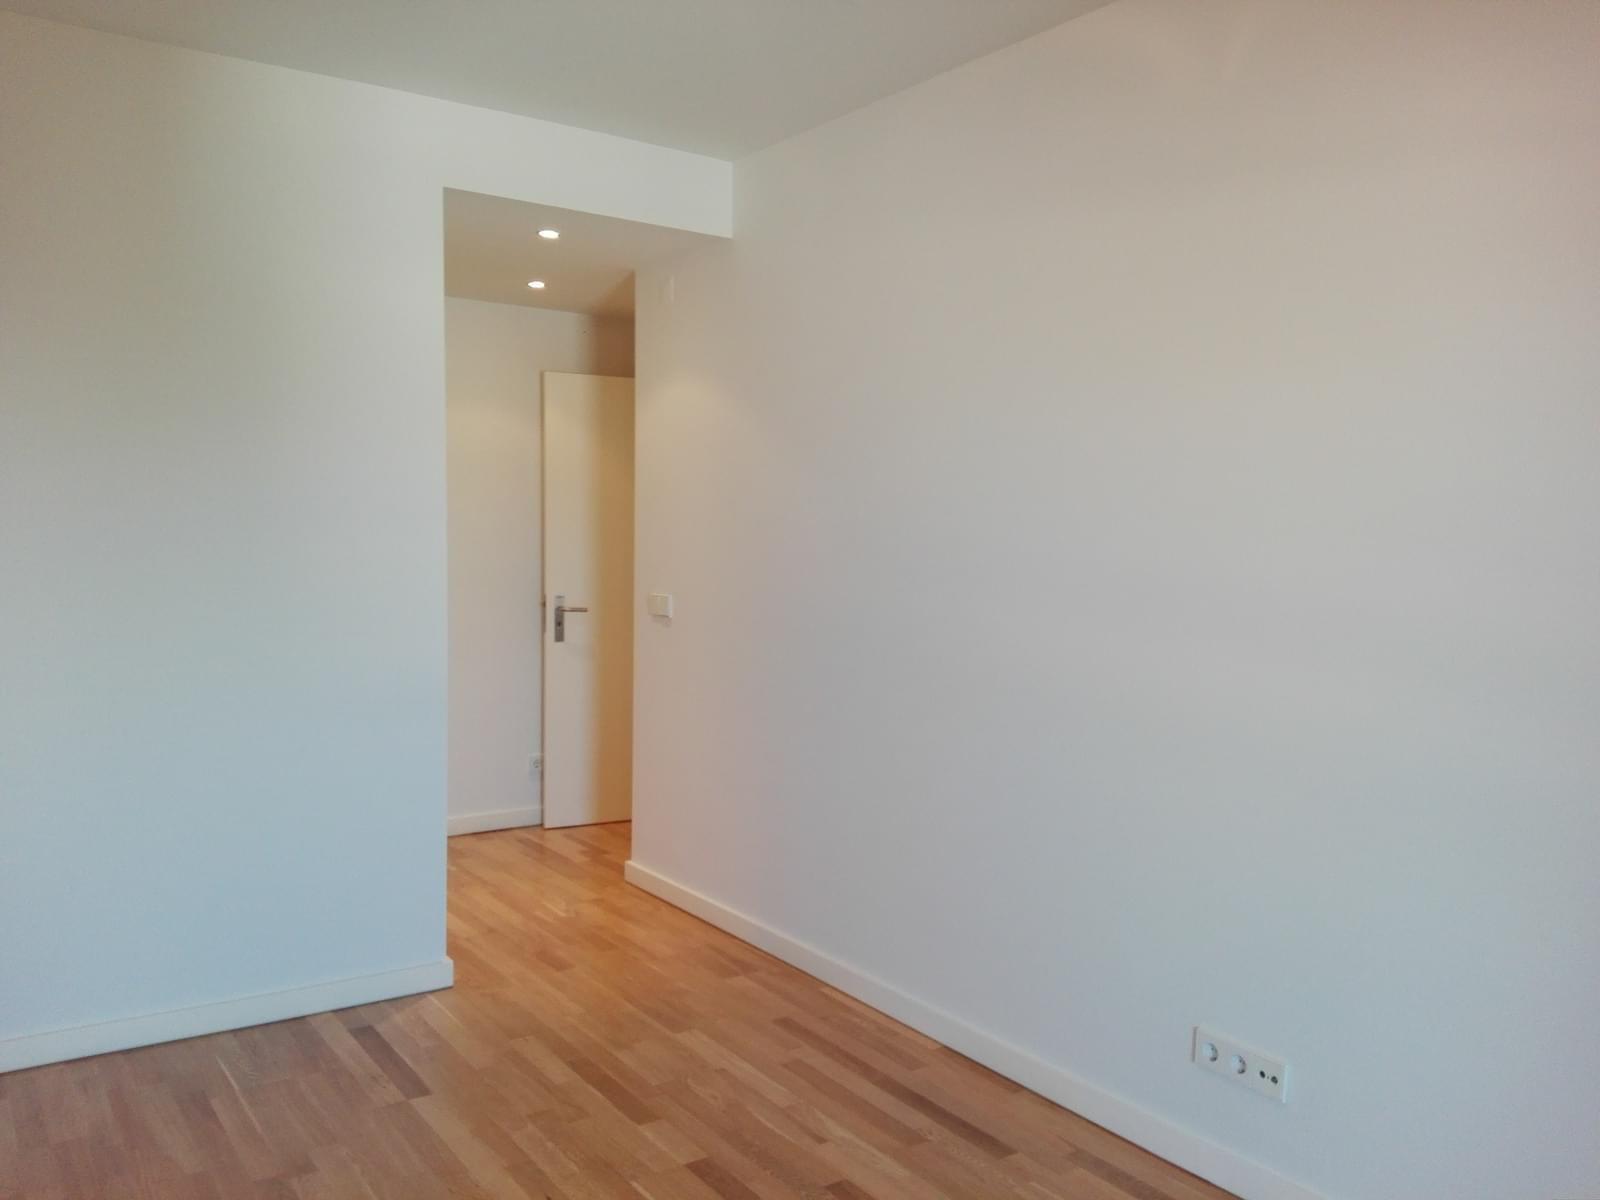 pf18814-apartamento-t2-lisboa-e442d693-62d9-4b73-a03c-204a1e7fcde9